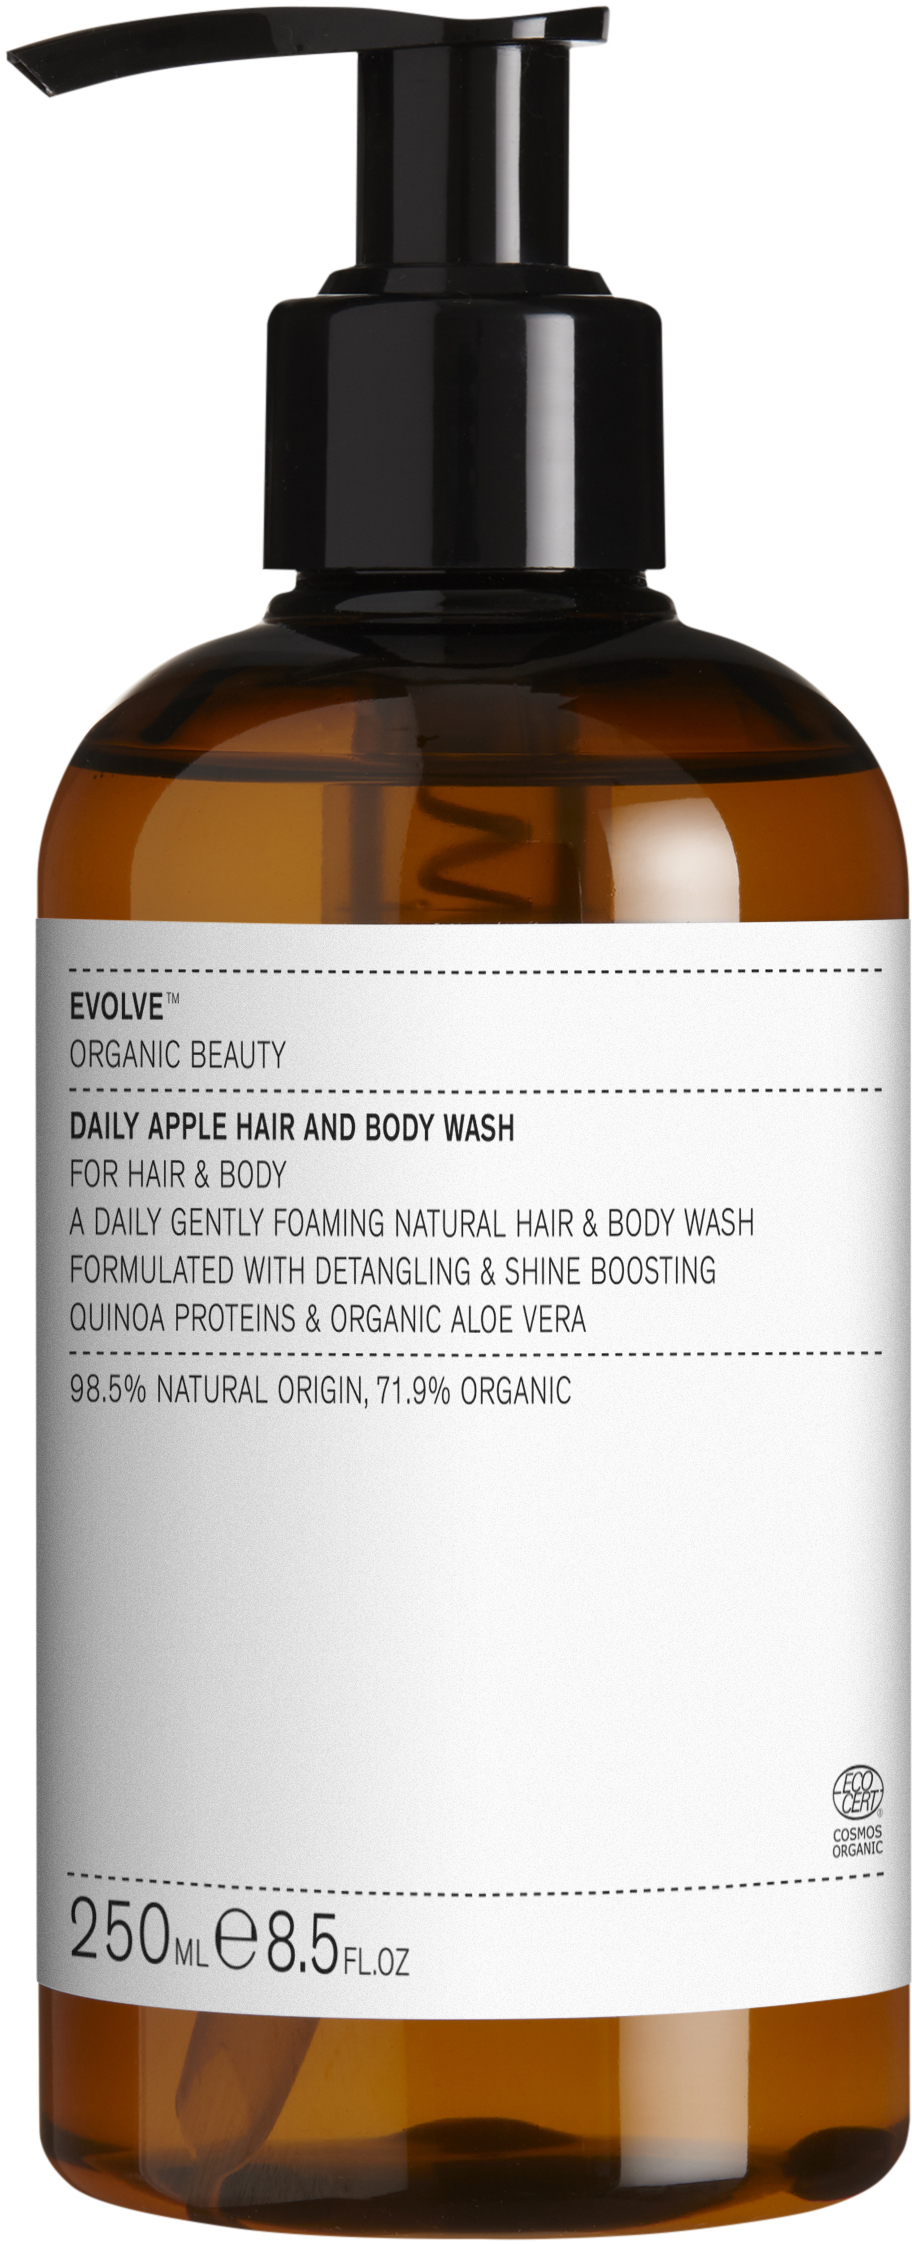 Evolve Daily Apple Hair & Body Wash, 250 ml